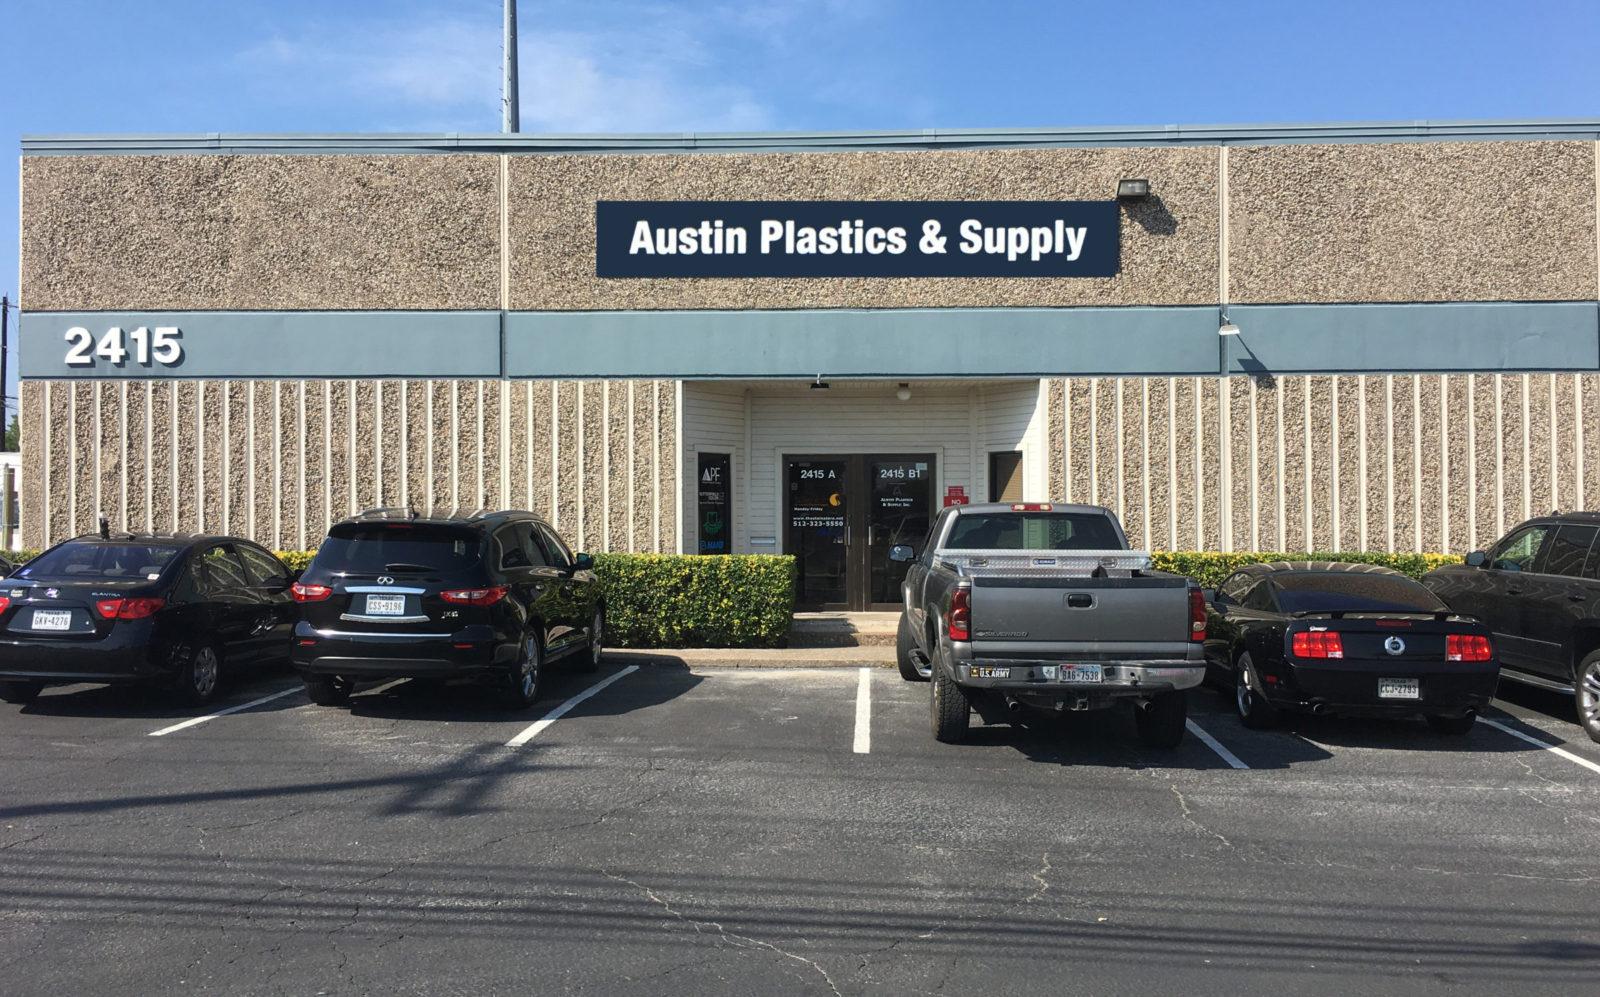 Our Location: 2415 Kramer Ln Ste. B, Austin, TX 78758